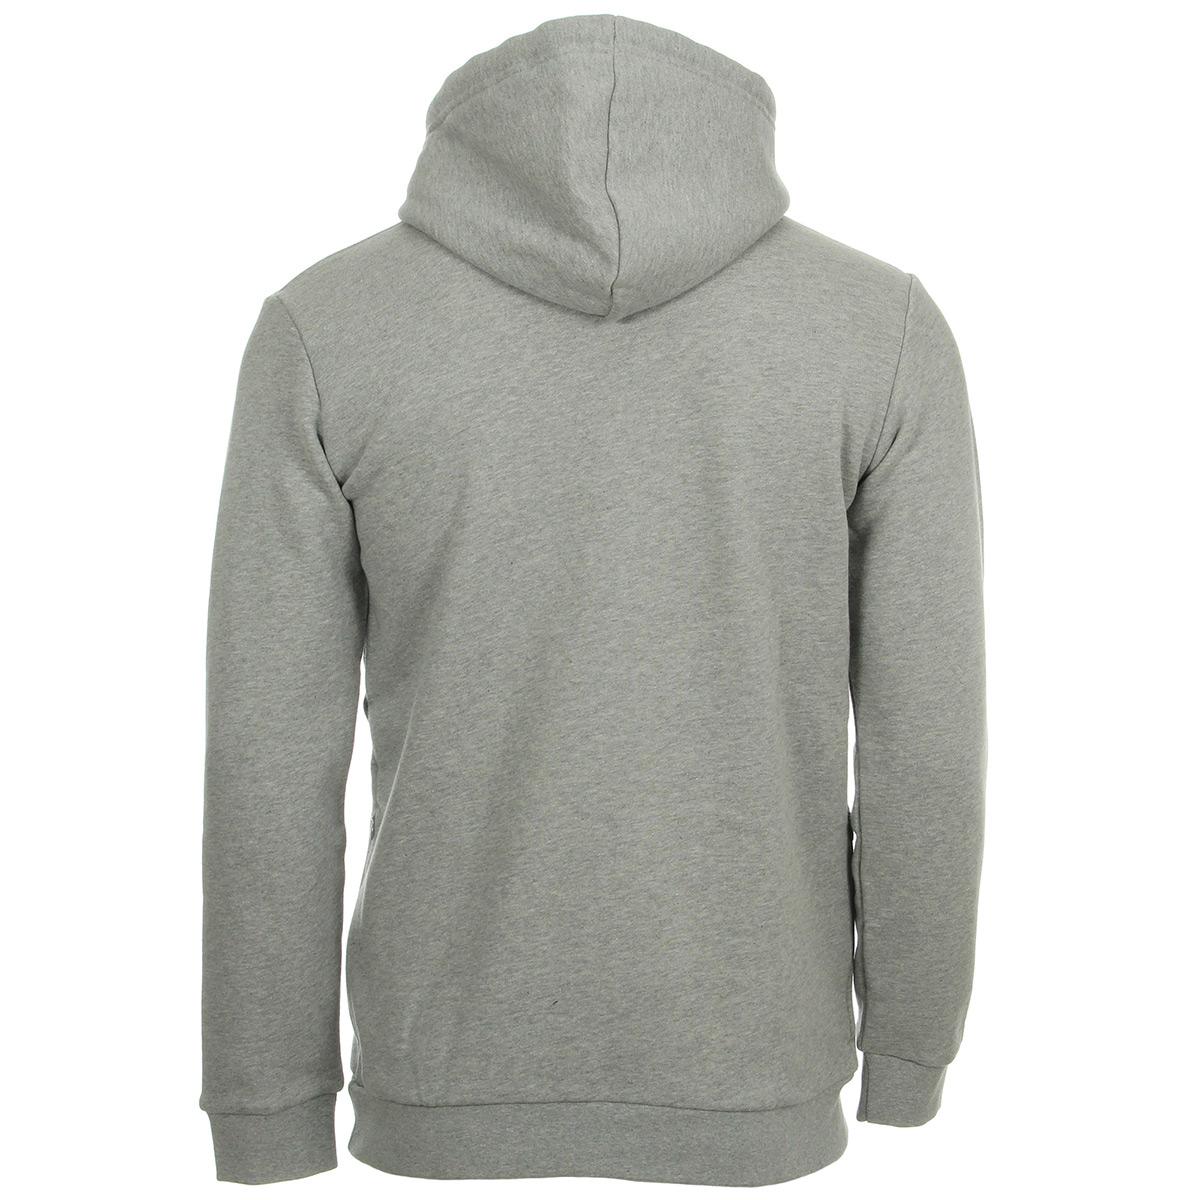 adidas Trefoil Warm U Hoodie CY4572, Sweats homme